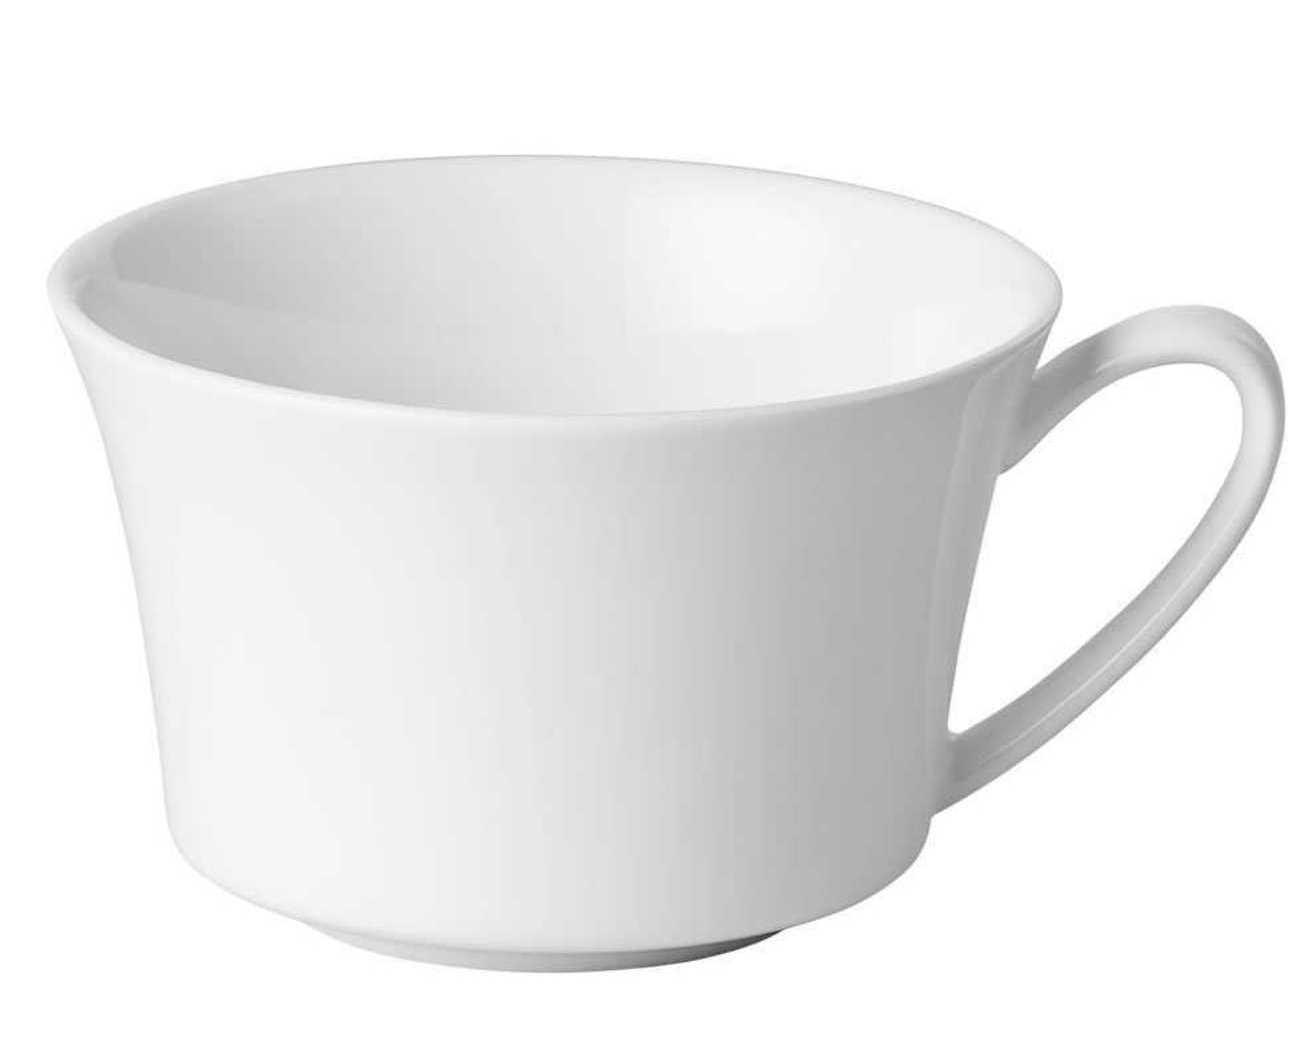 Чашка фарфоровая Rosenthal JADE, объем 0,22 л, белый Rosenthal 61040-800001-14642 фото 1